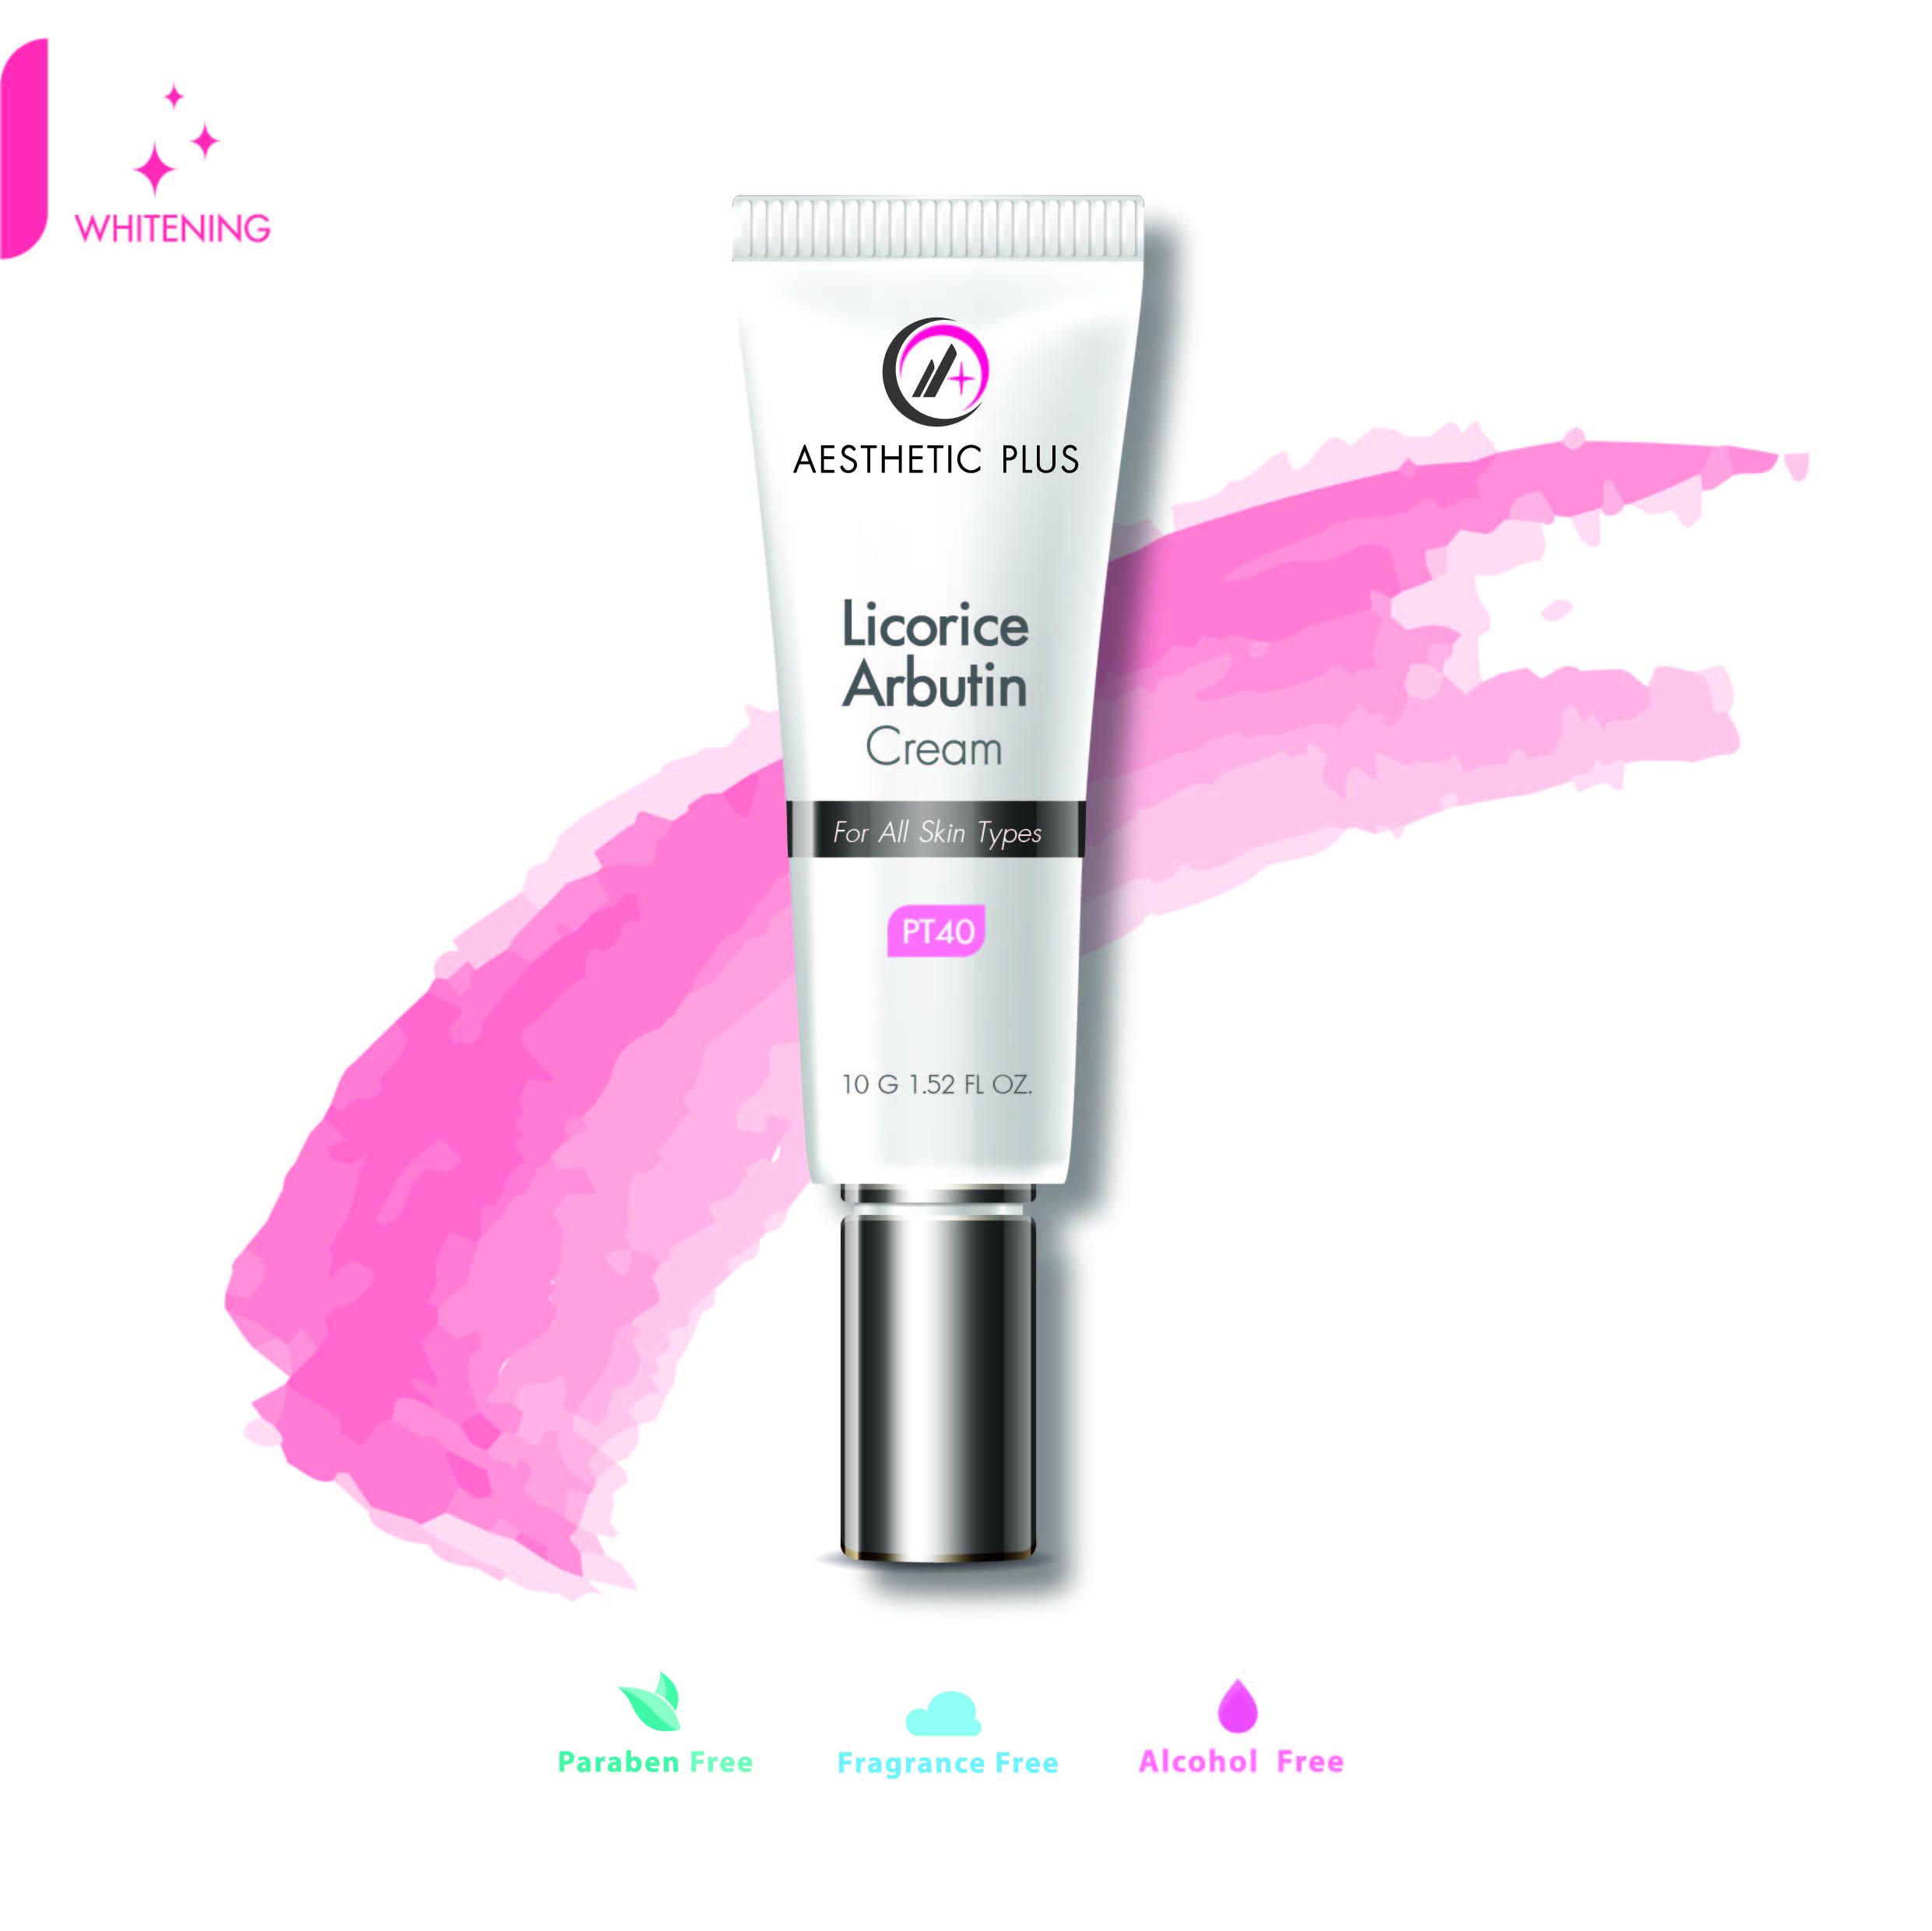 PT40  :  Licorice Arbutin Cream   ลิโคไรซ์ครีมเข้มข้น   / For all skin types